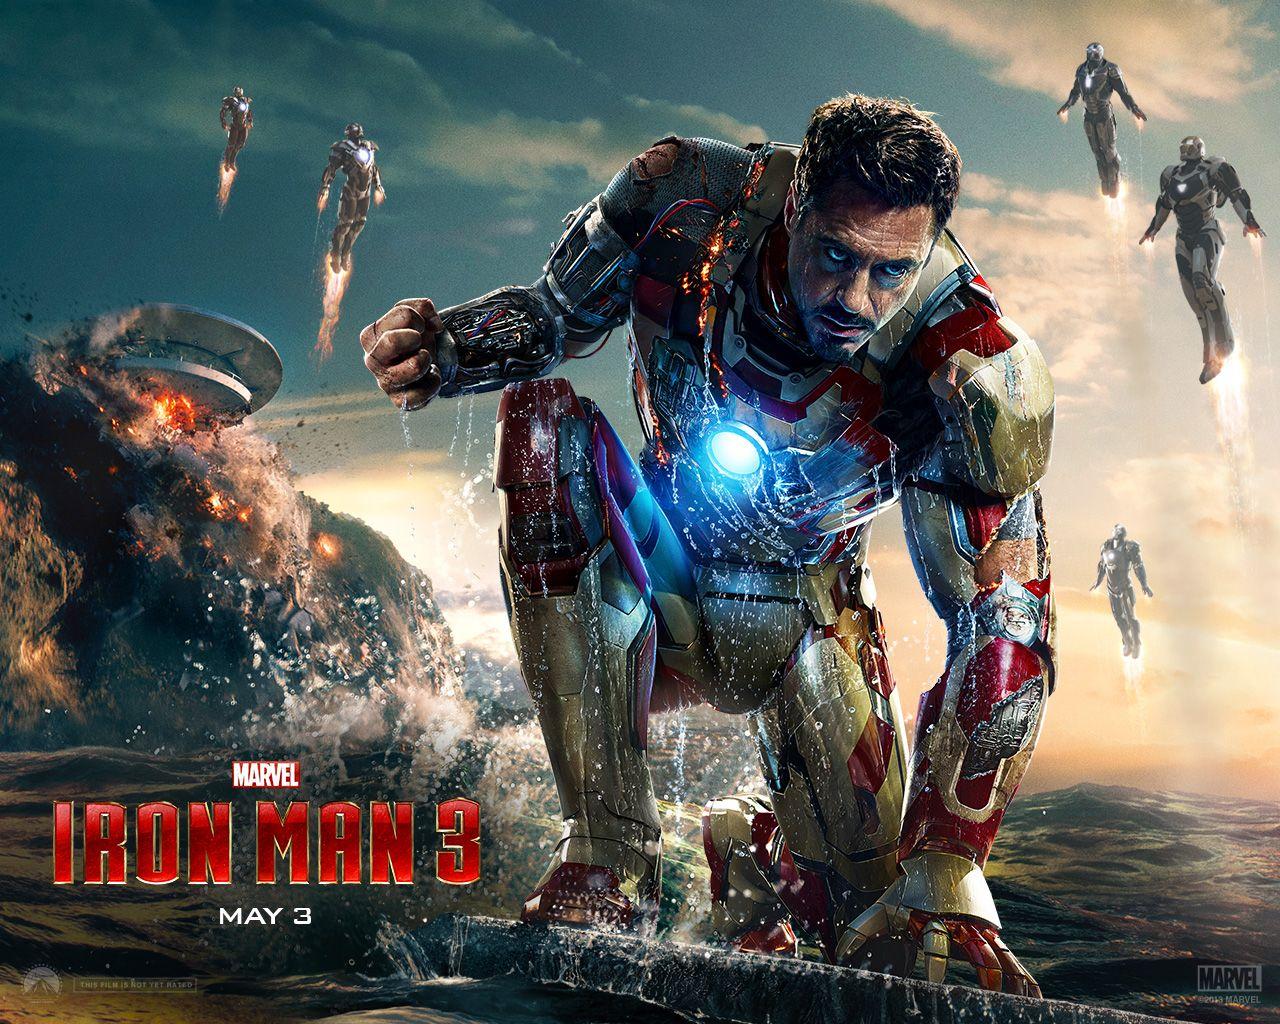 Iron Man 3 Hd Wallpapers For Your Windows 8 Desktop Ultron